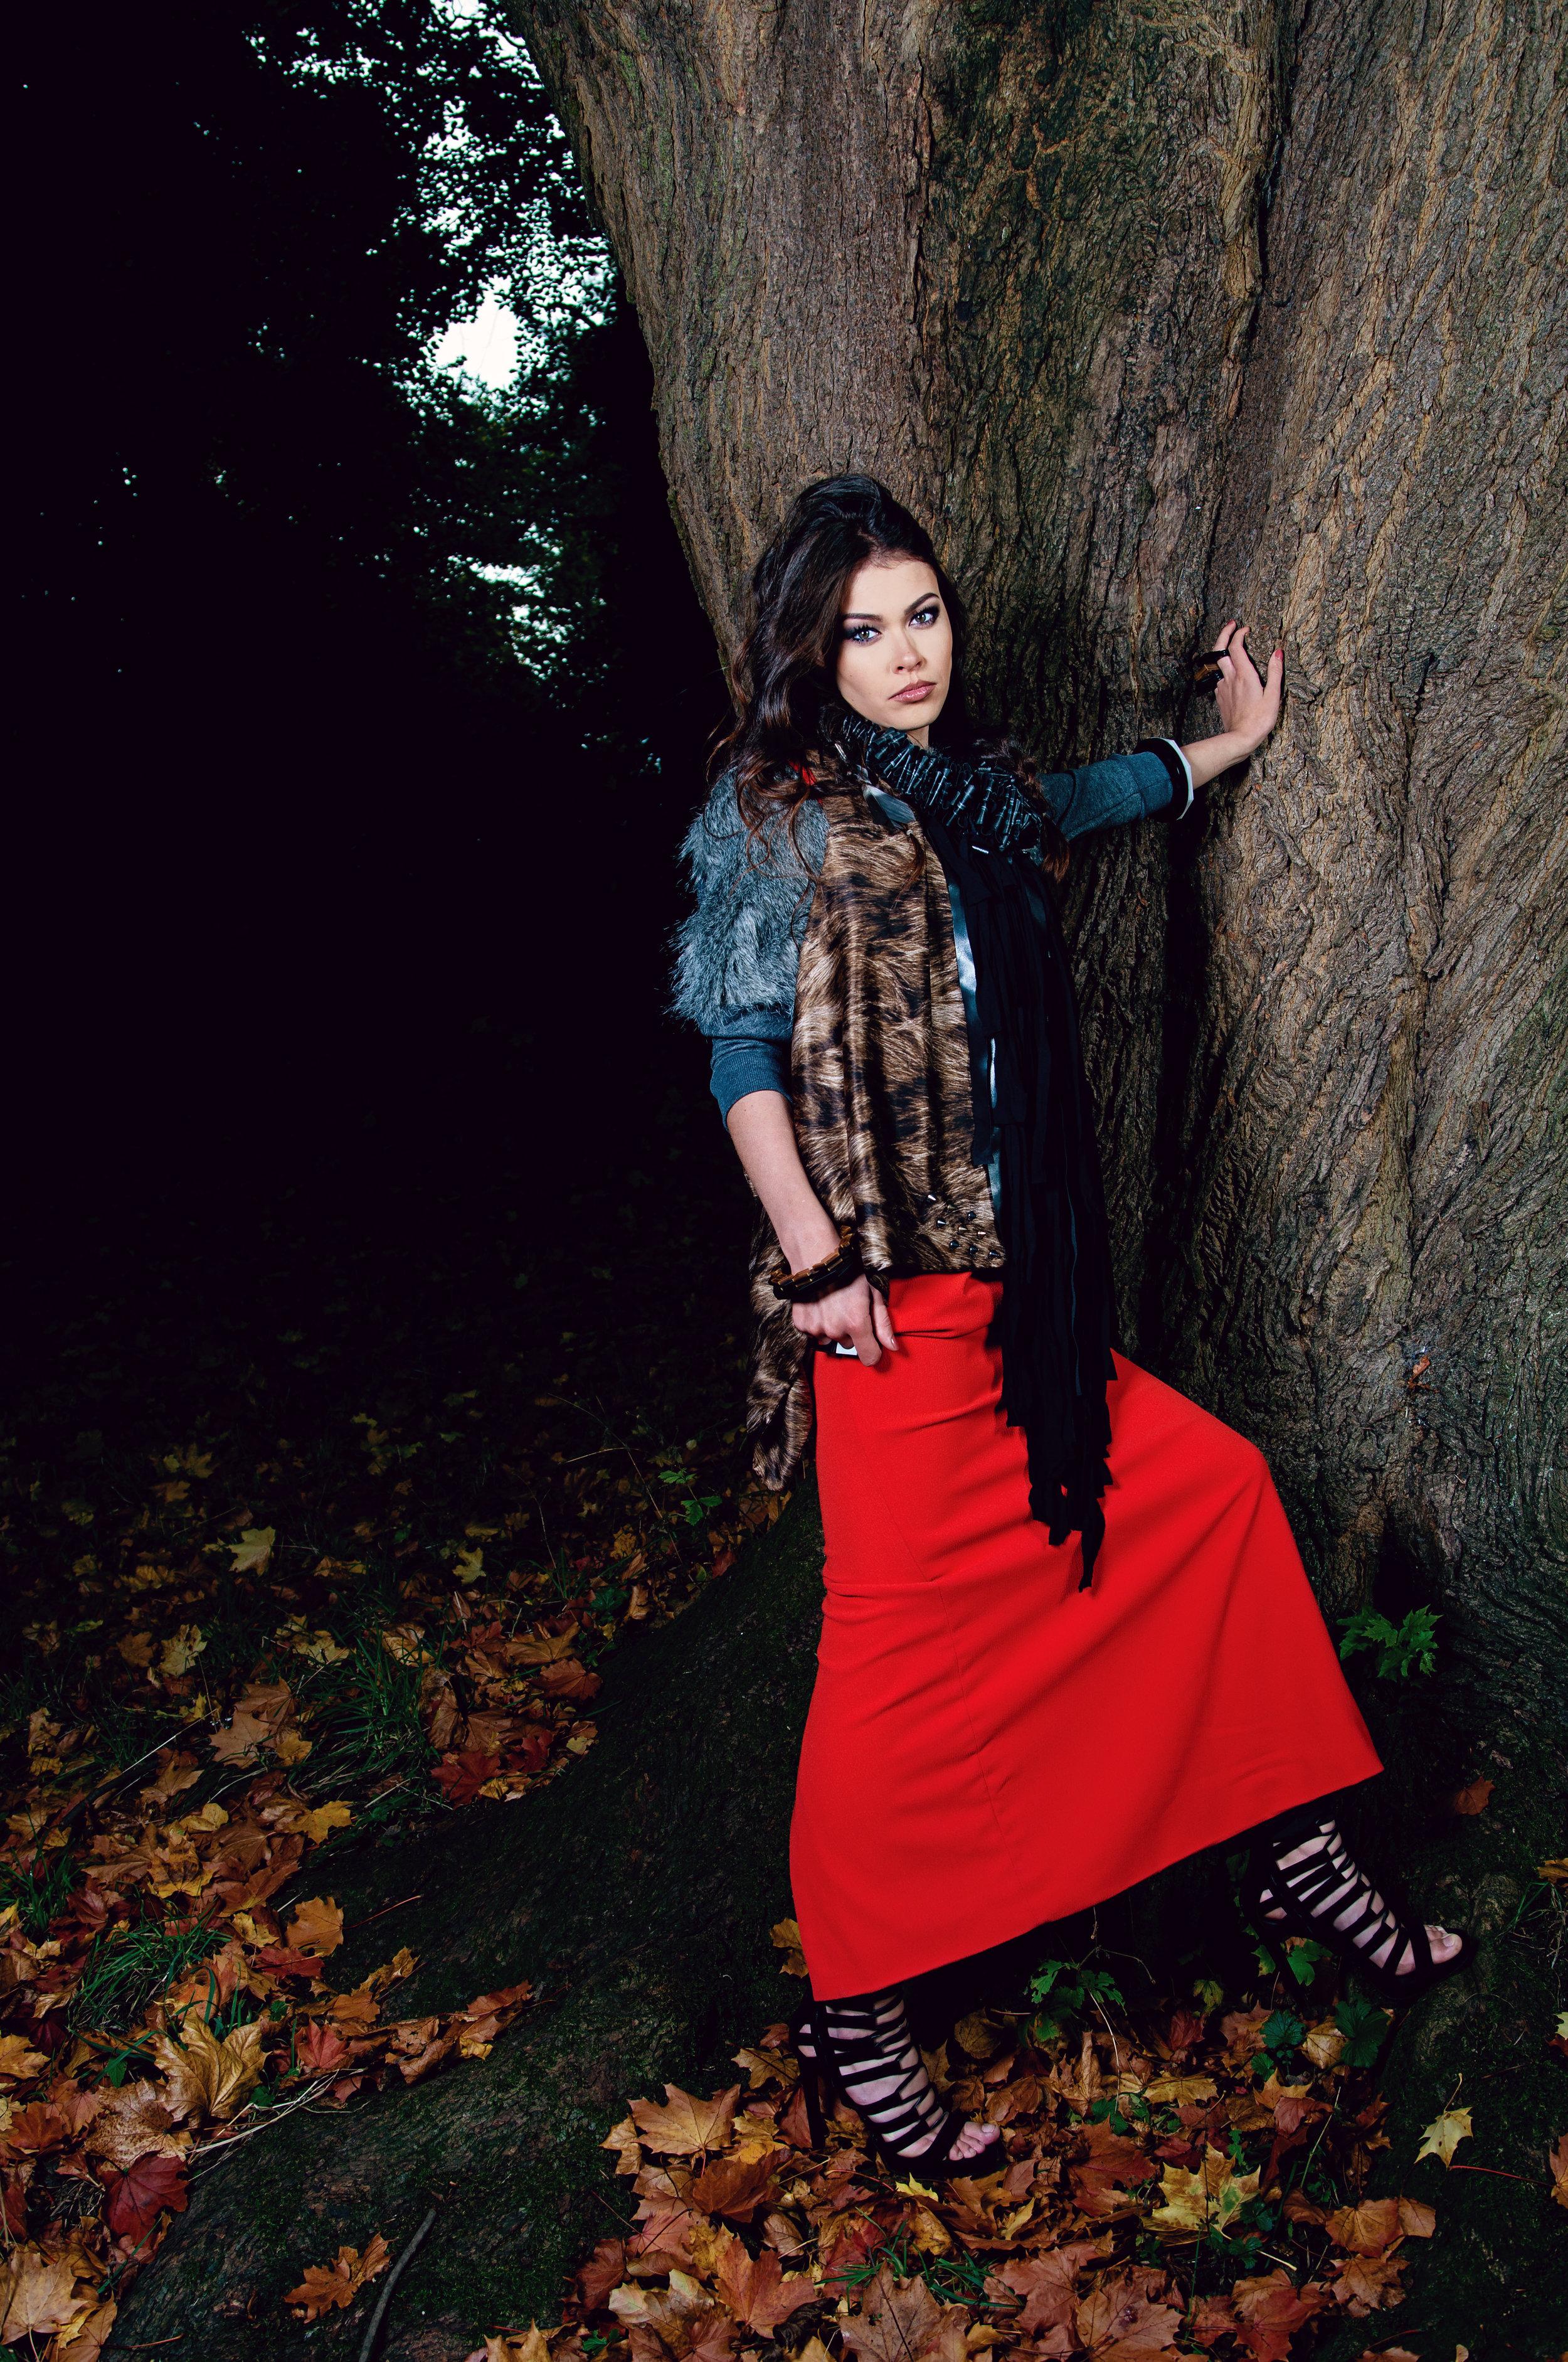 zaramia-ava-zaramiaava-leeds-fashion-designer-ethical-sustainable-tailored-minimalist-jacket-accent-coat-jacket-print-shirt-top-versatile-drape-cowl-styling-shop-womenswear-models-photoshoot-colour-9